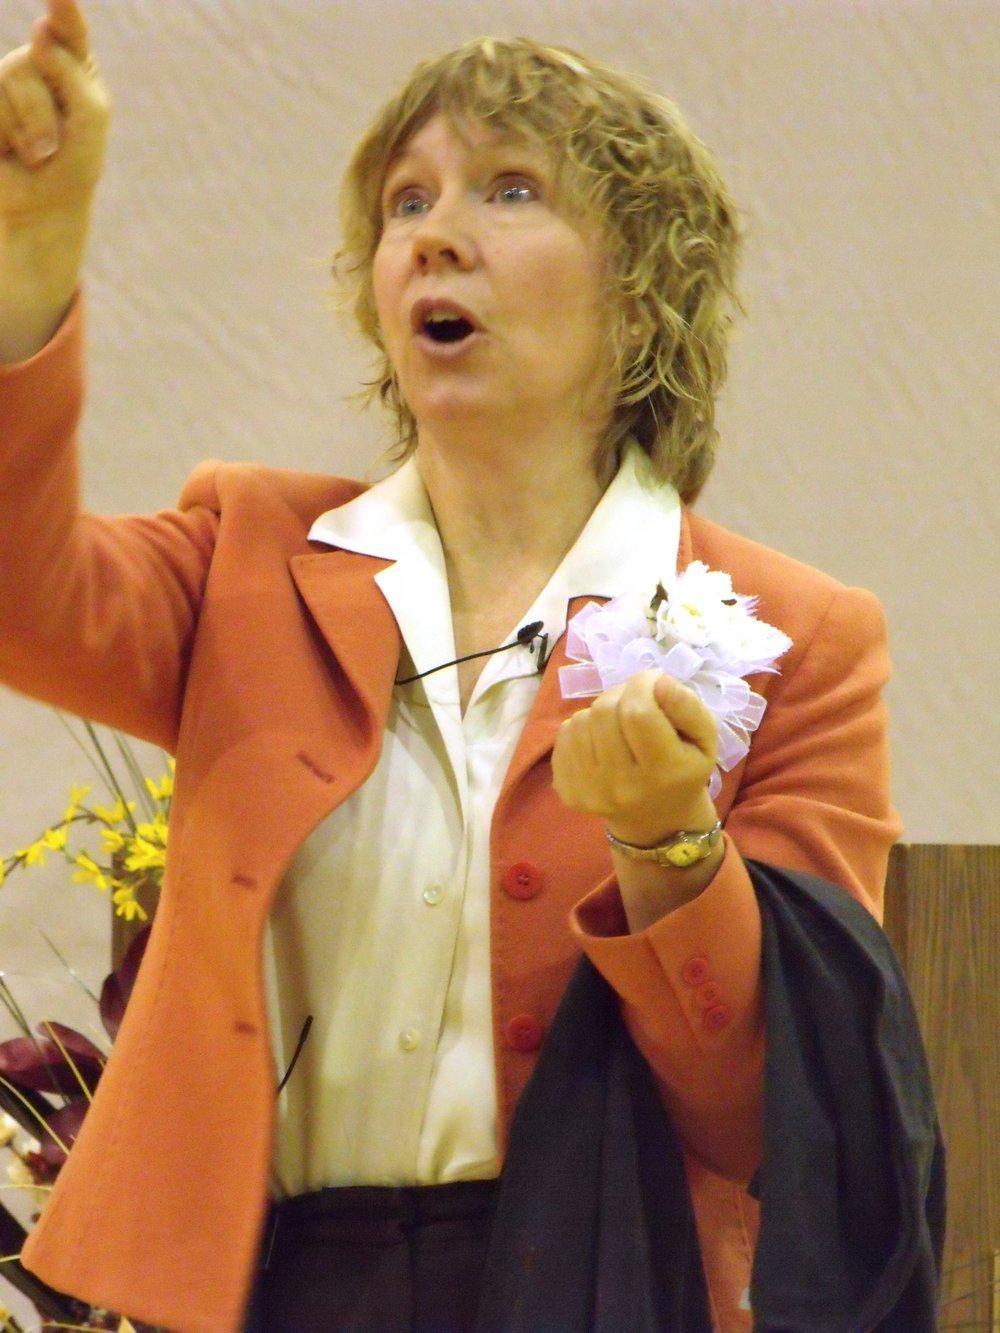 Gracia Burnham - Gracia Burnham holding an unidentified item as she is speaking.